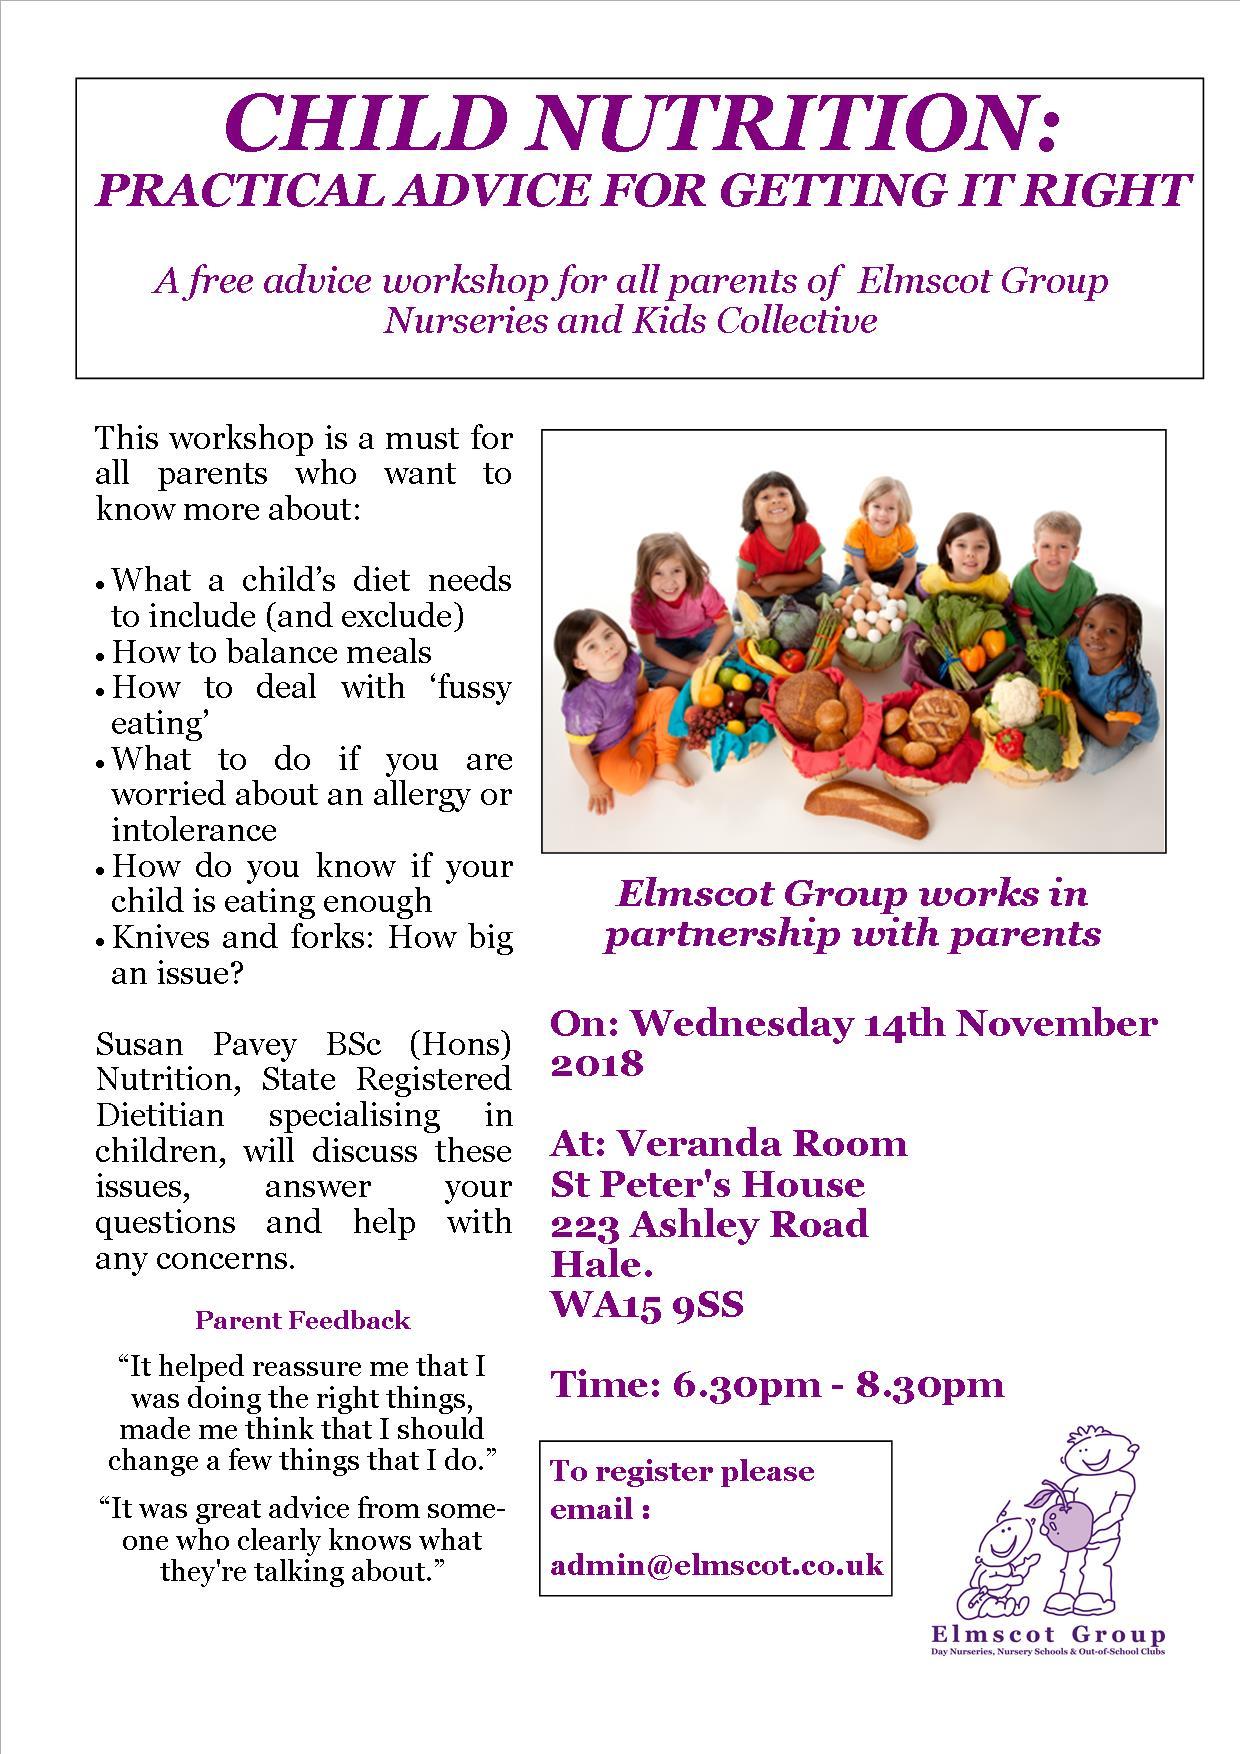 Child Nutrition poster 2018 - Elmscot Group